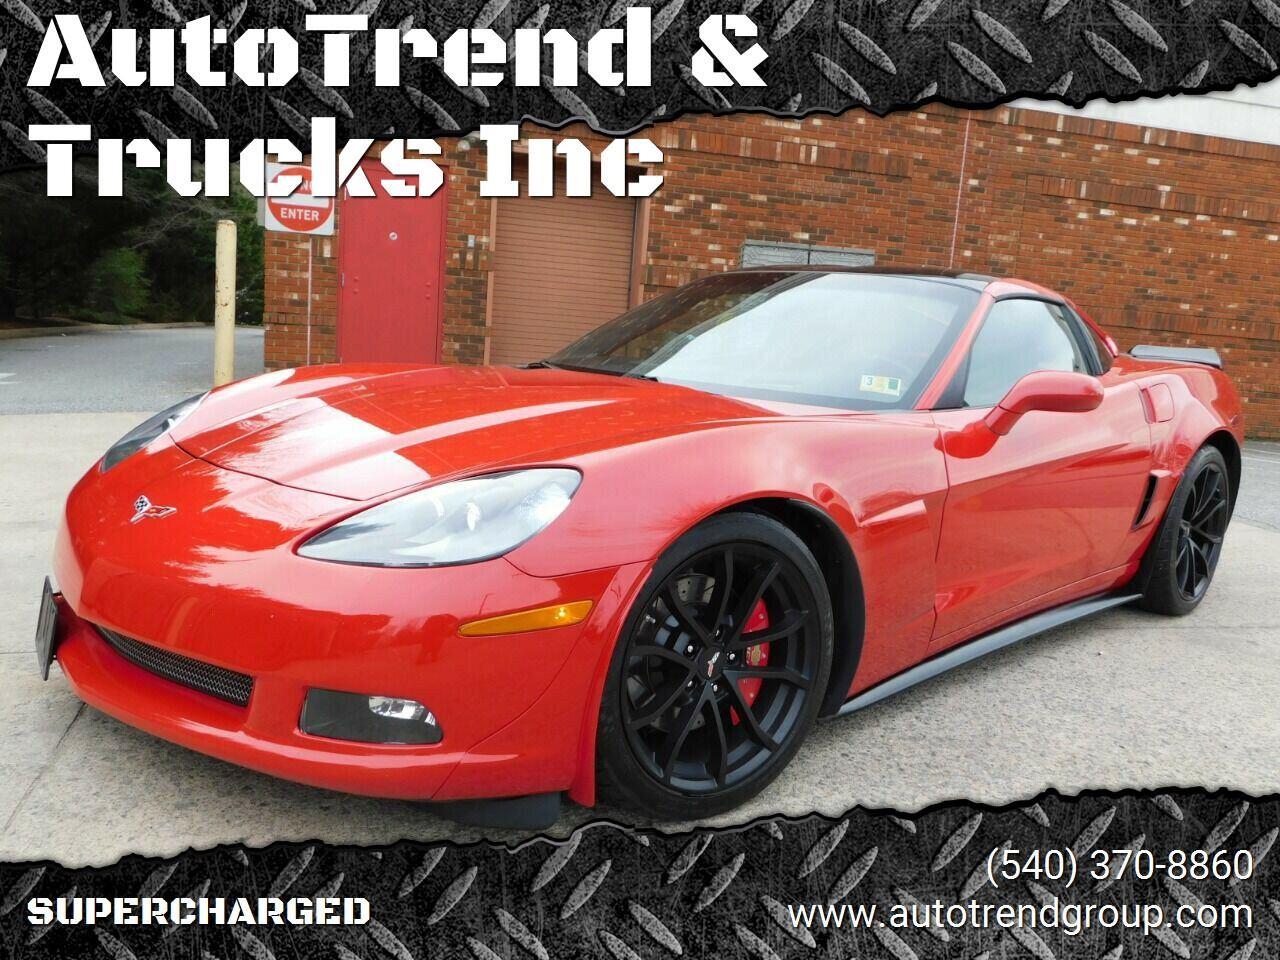 AutoTrend & Trucks Inc